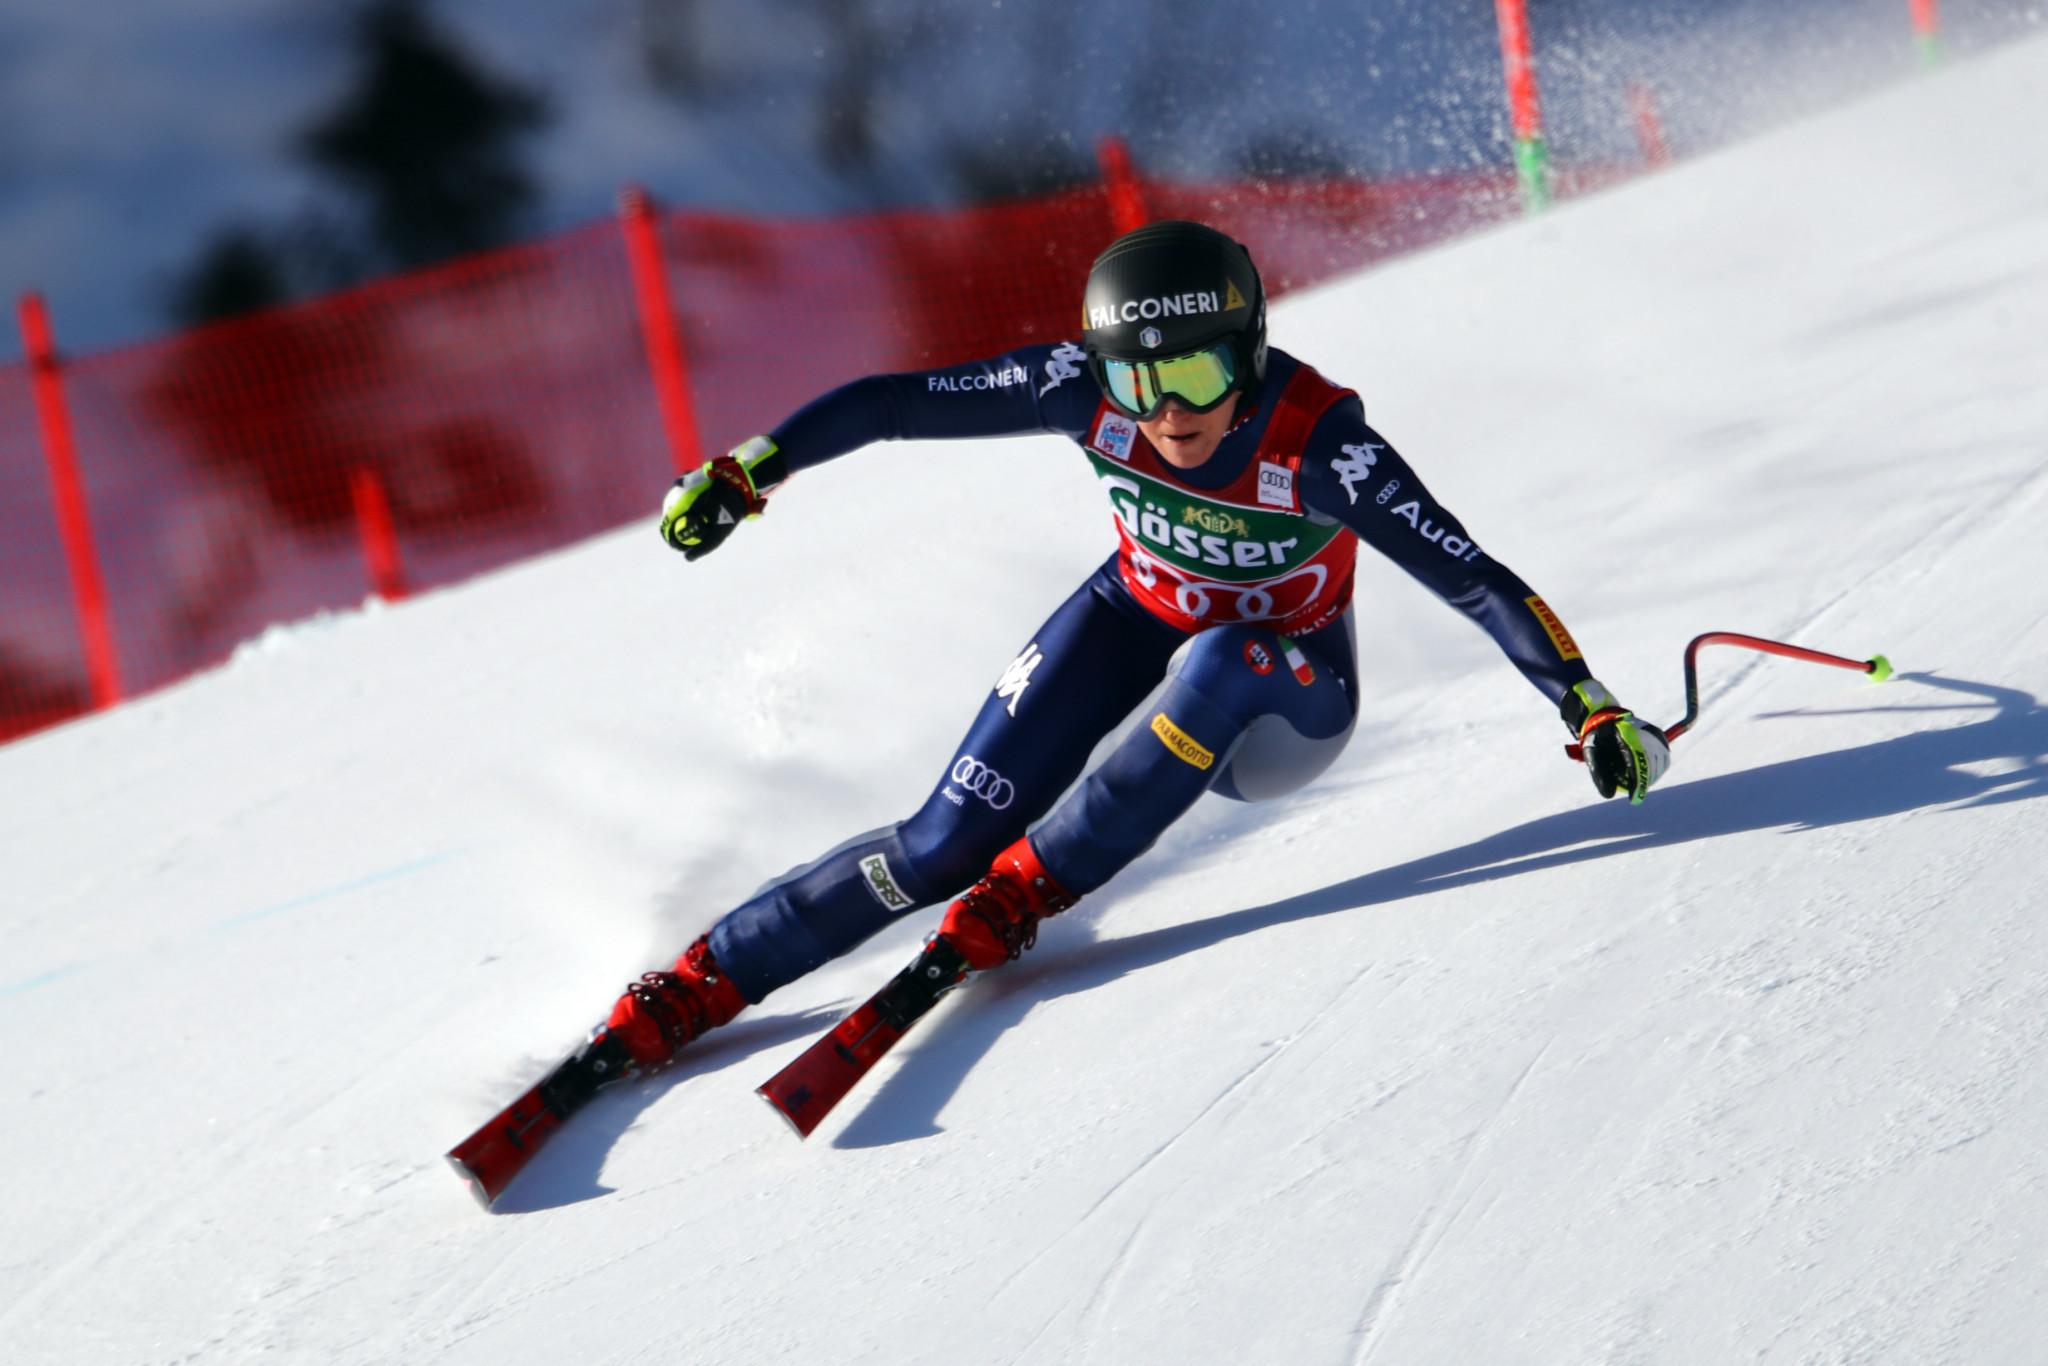 Goggia wins in St Anton to take sole possession of World Cup downhill lead